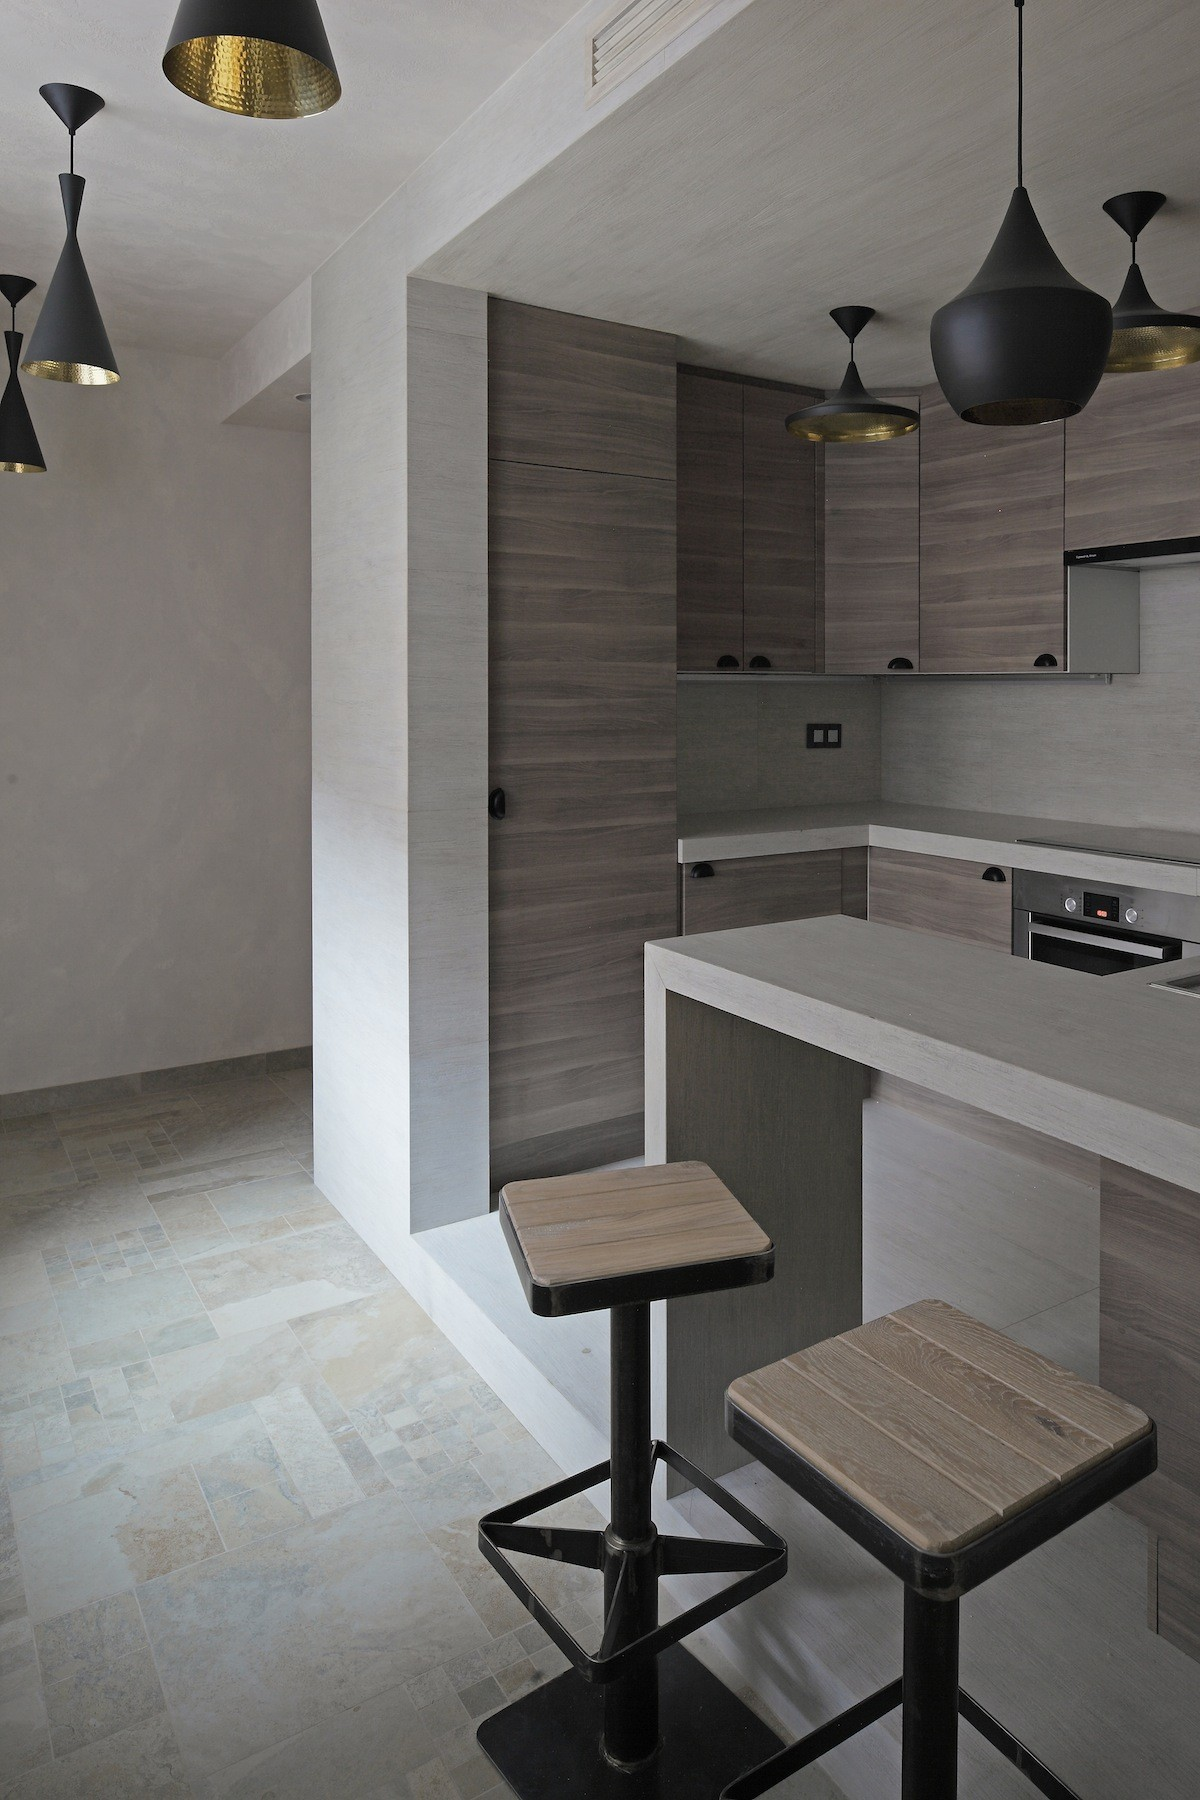 Peter Kostelov Smolenka Oak Tube Apartment kitchen